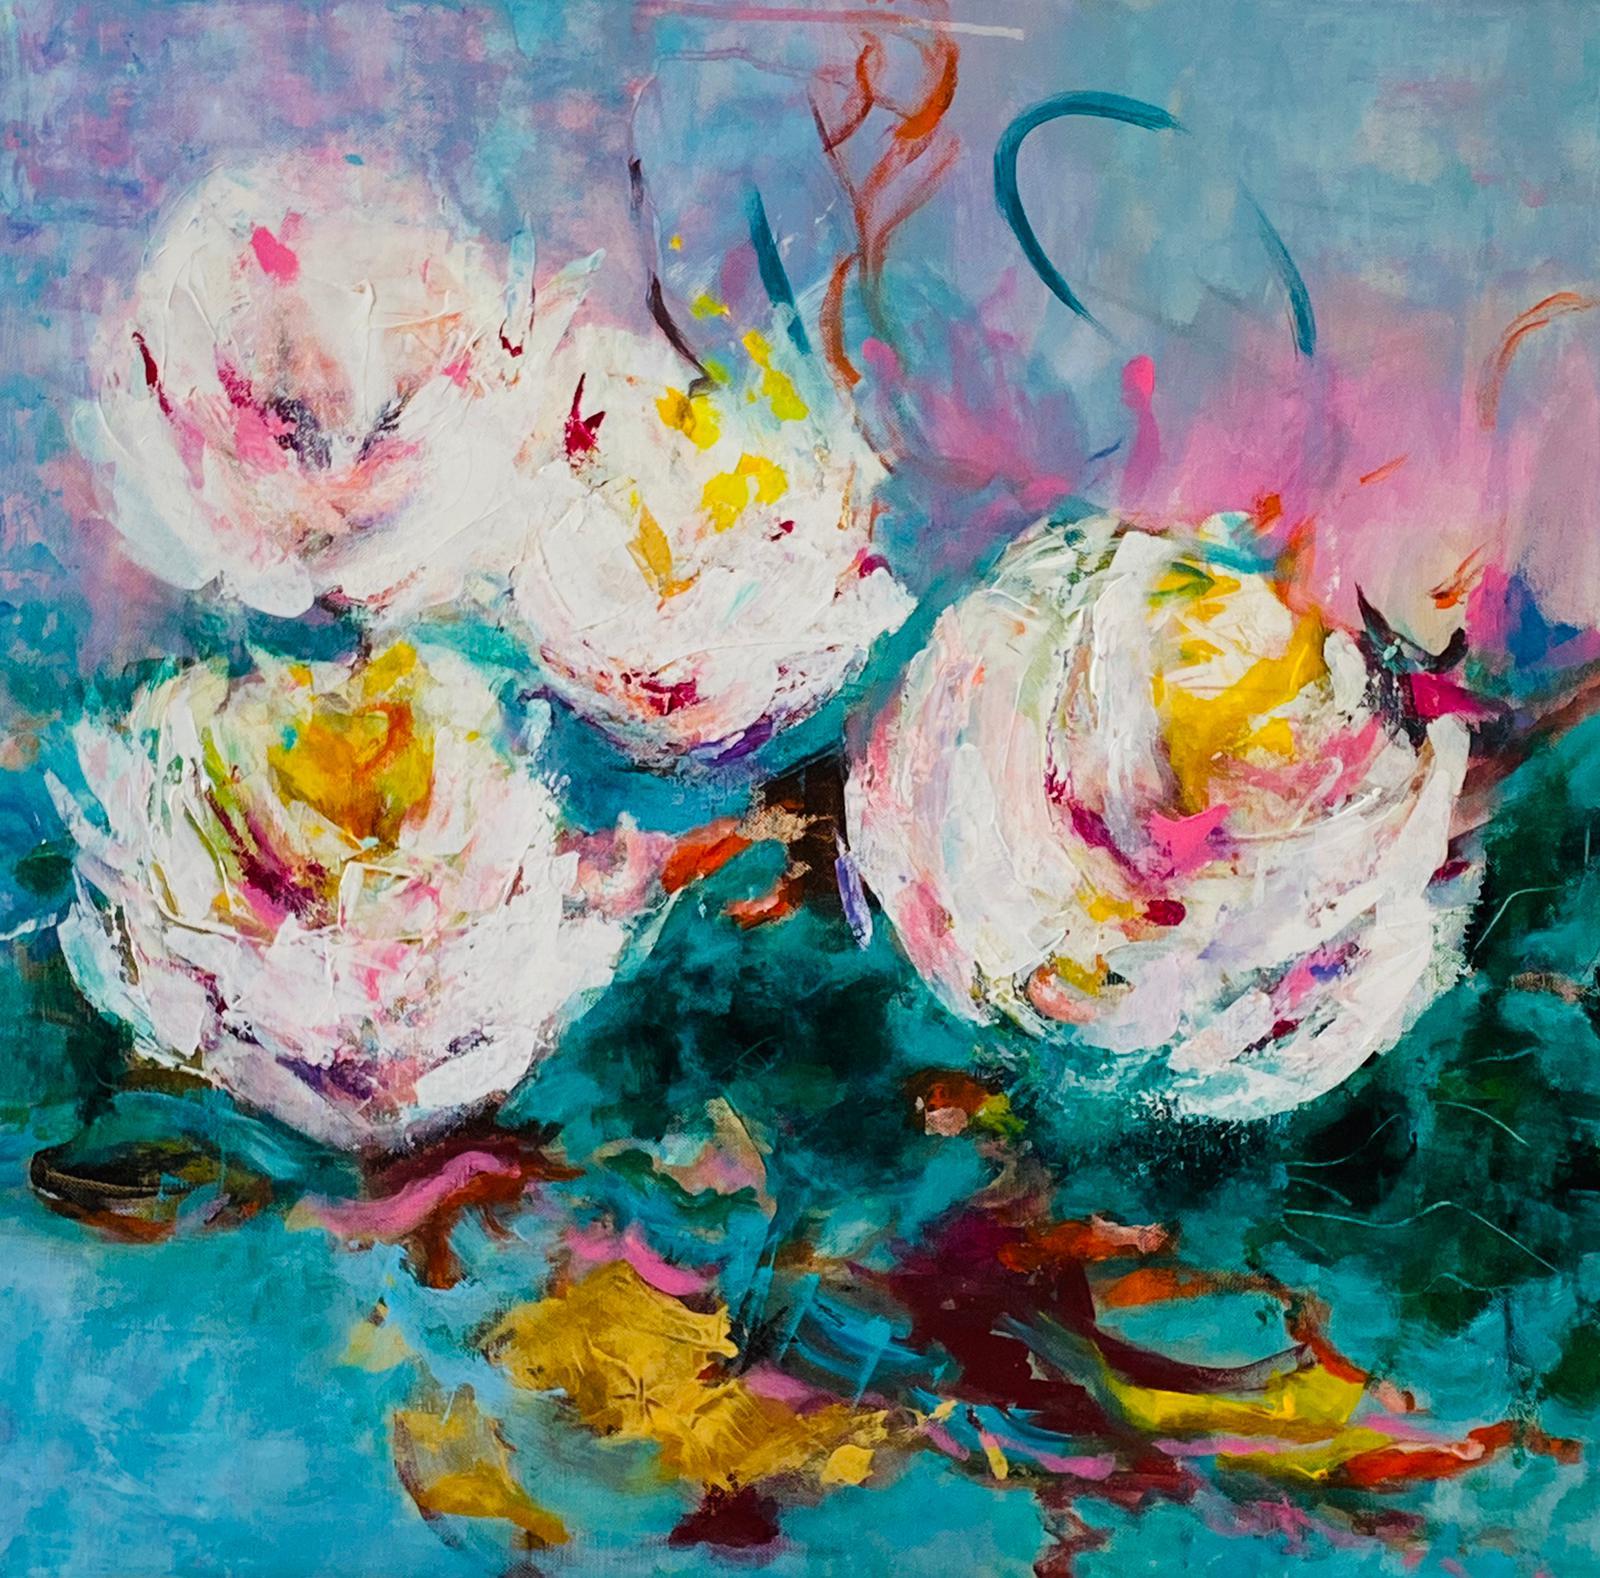 60 x 60 Gemälde von Gisela Kissing